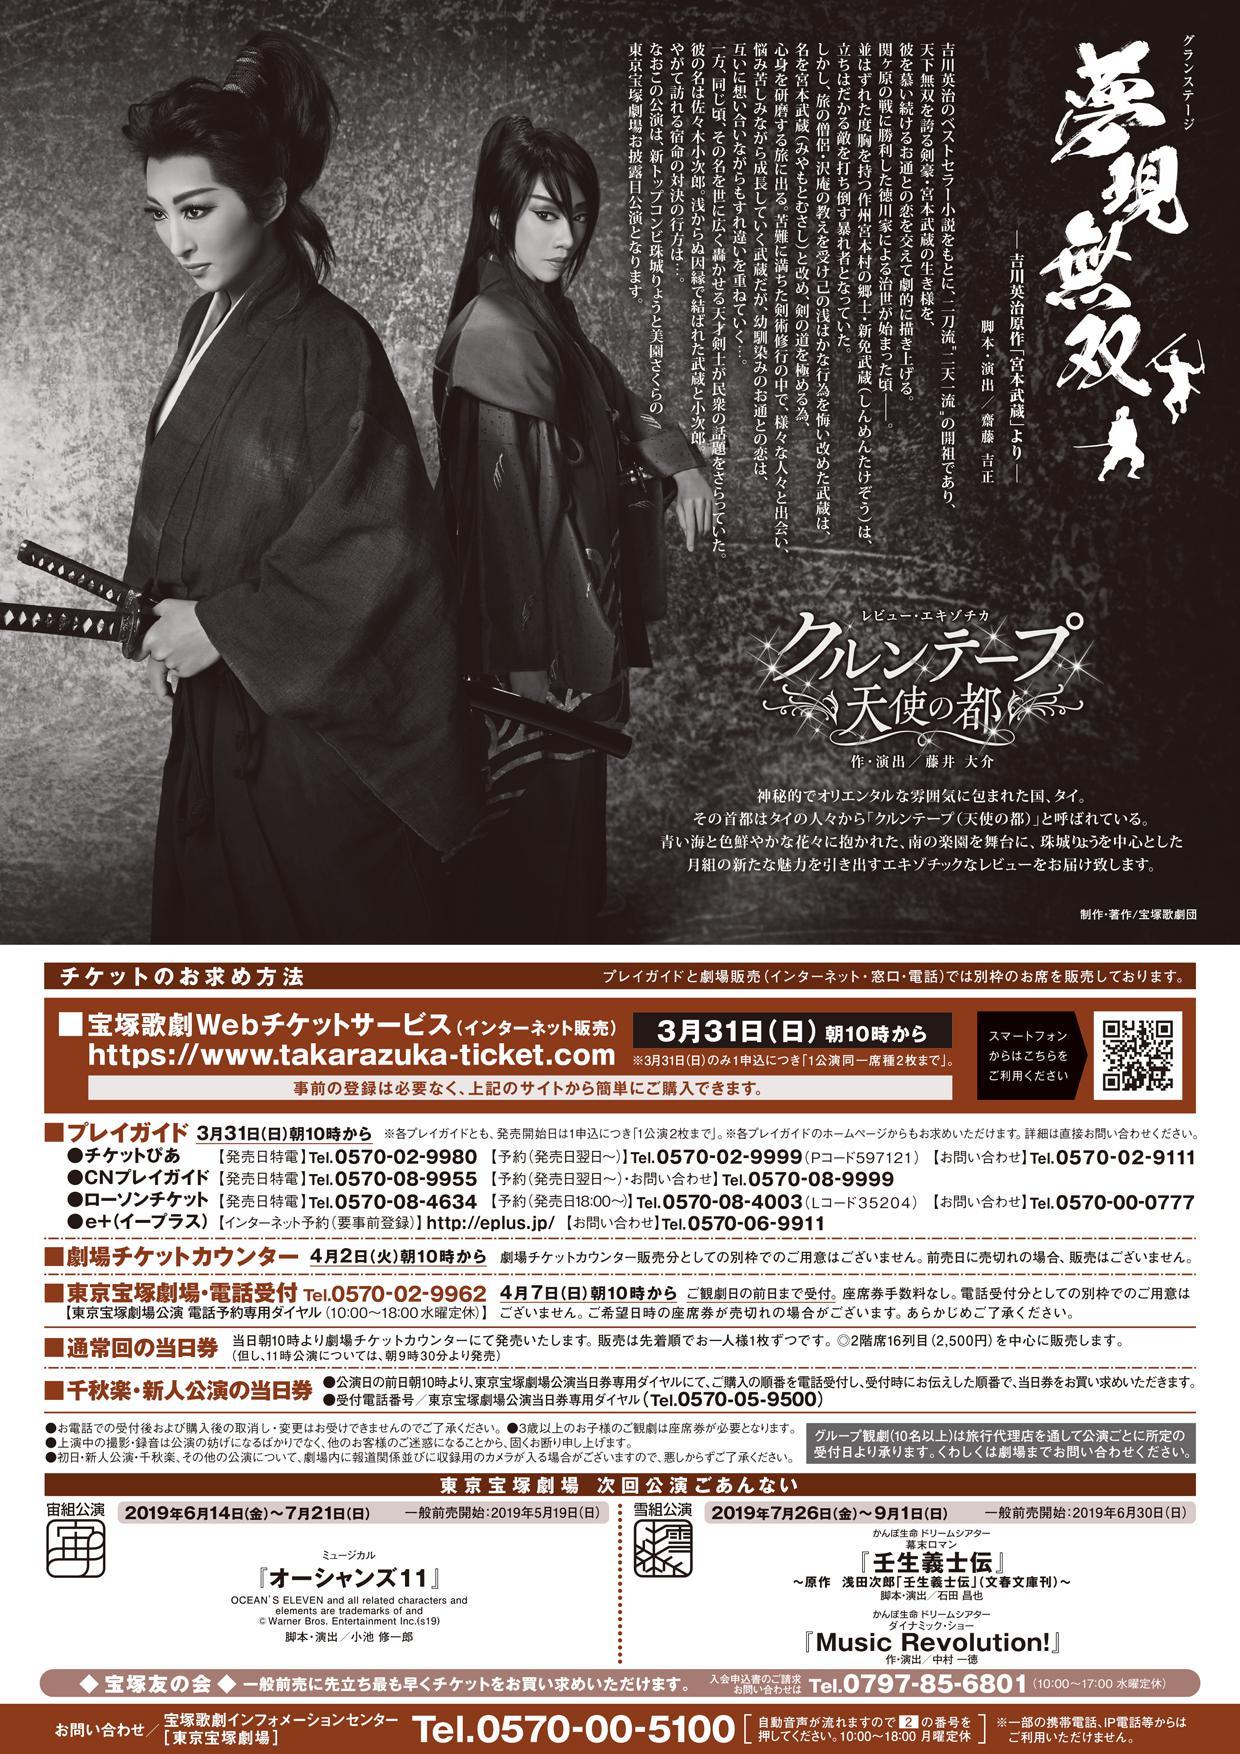 宝塚歌劇団月組公演「夢現無双 -吉川英治原作「宮本武蔵」より-」ポスター裏